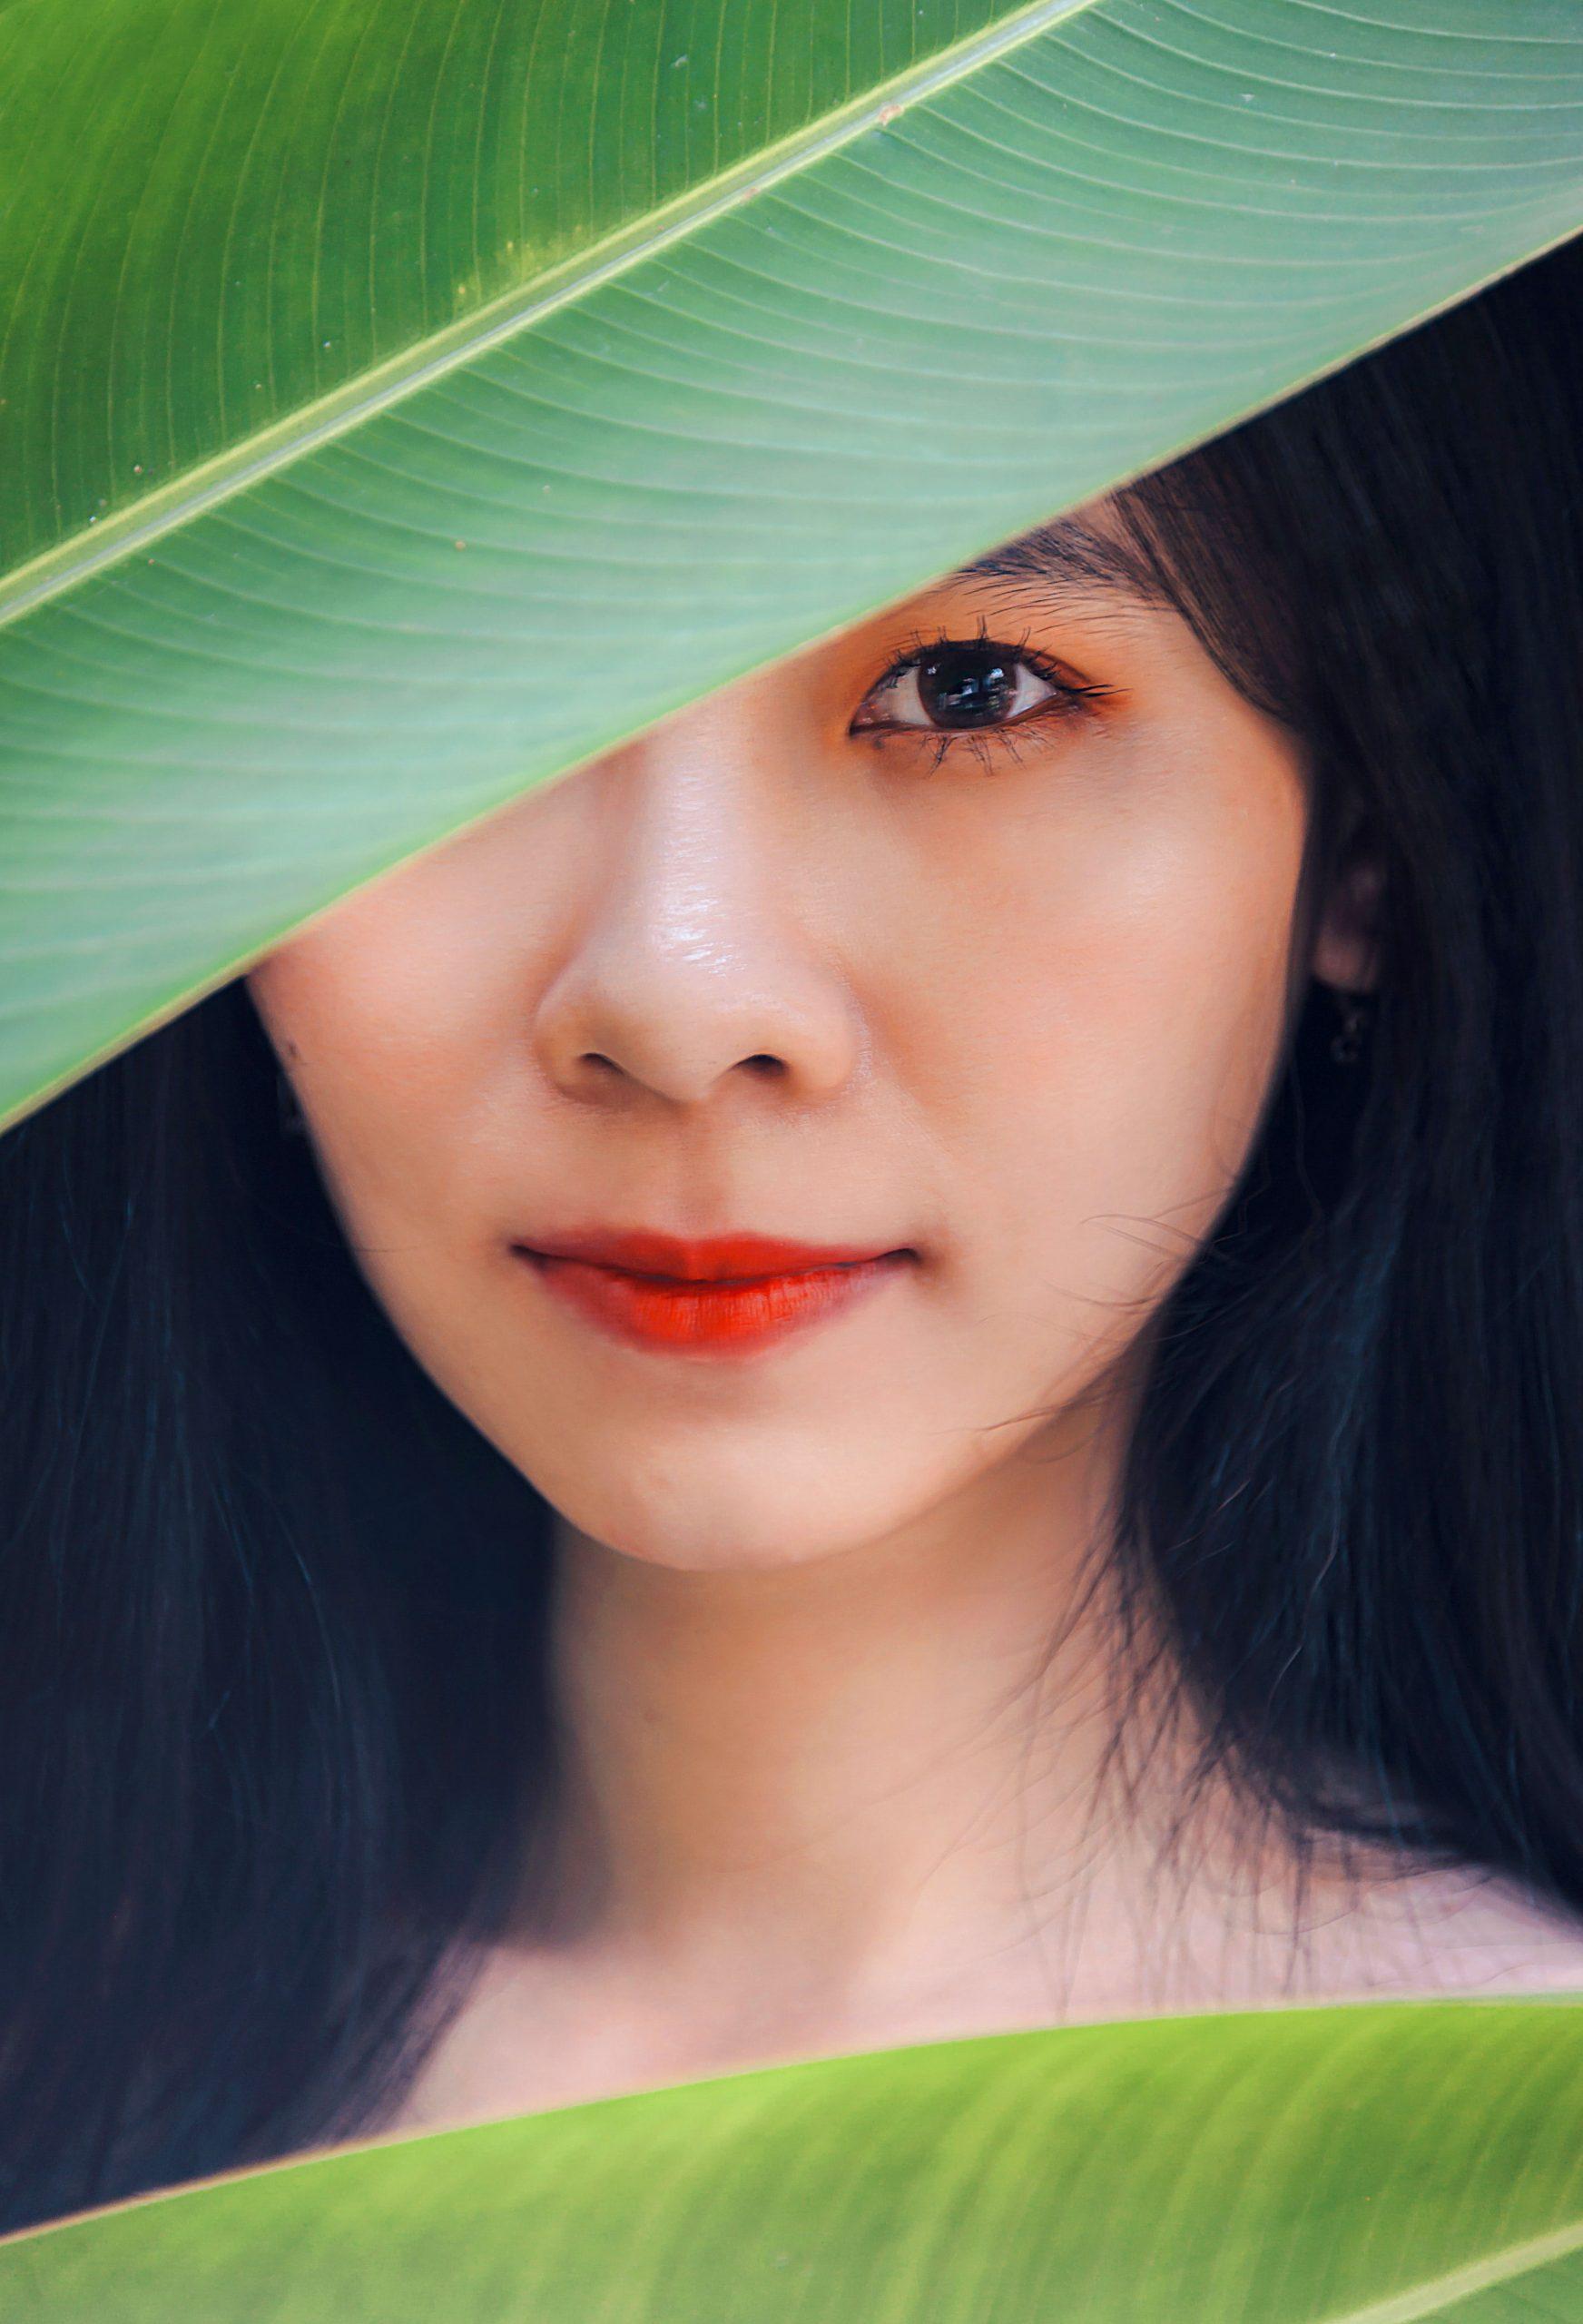 best 1080P Sad Girl Whatsapp Dp Images